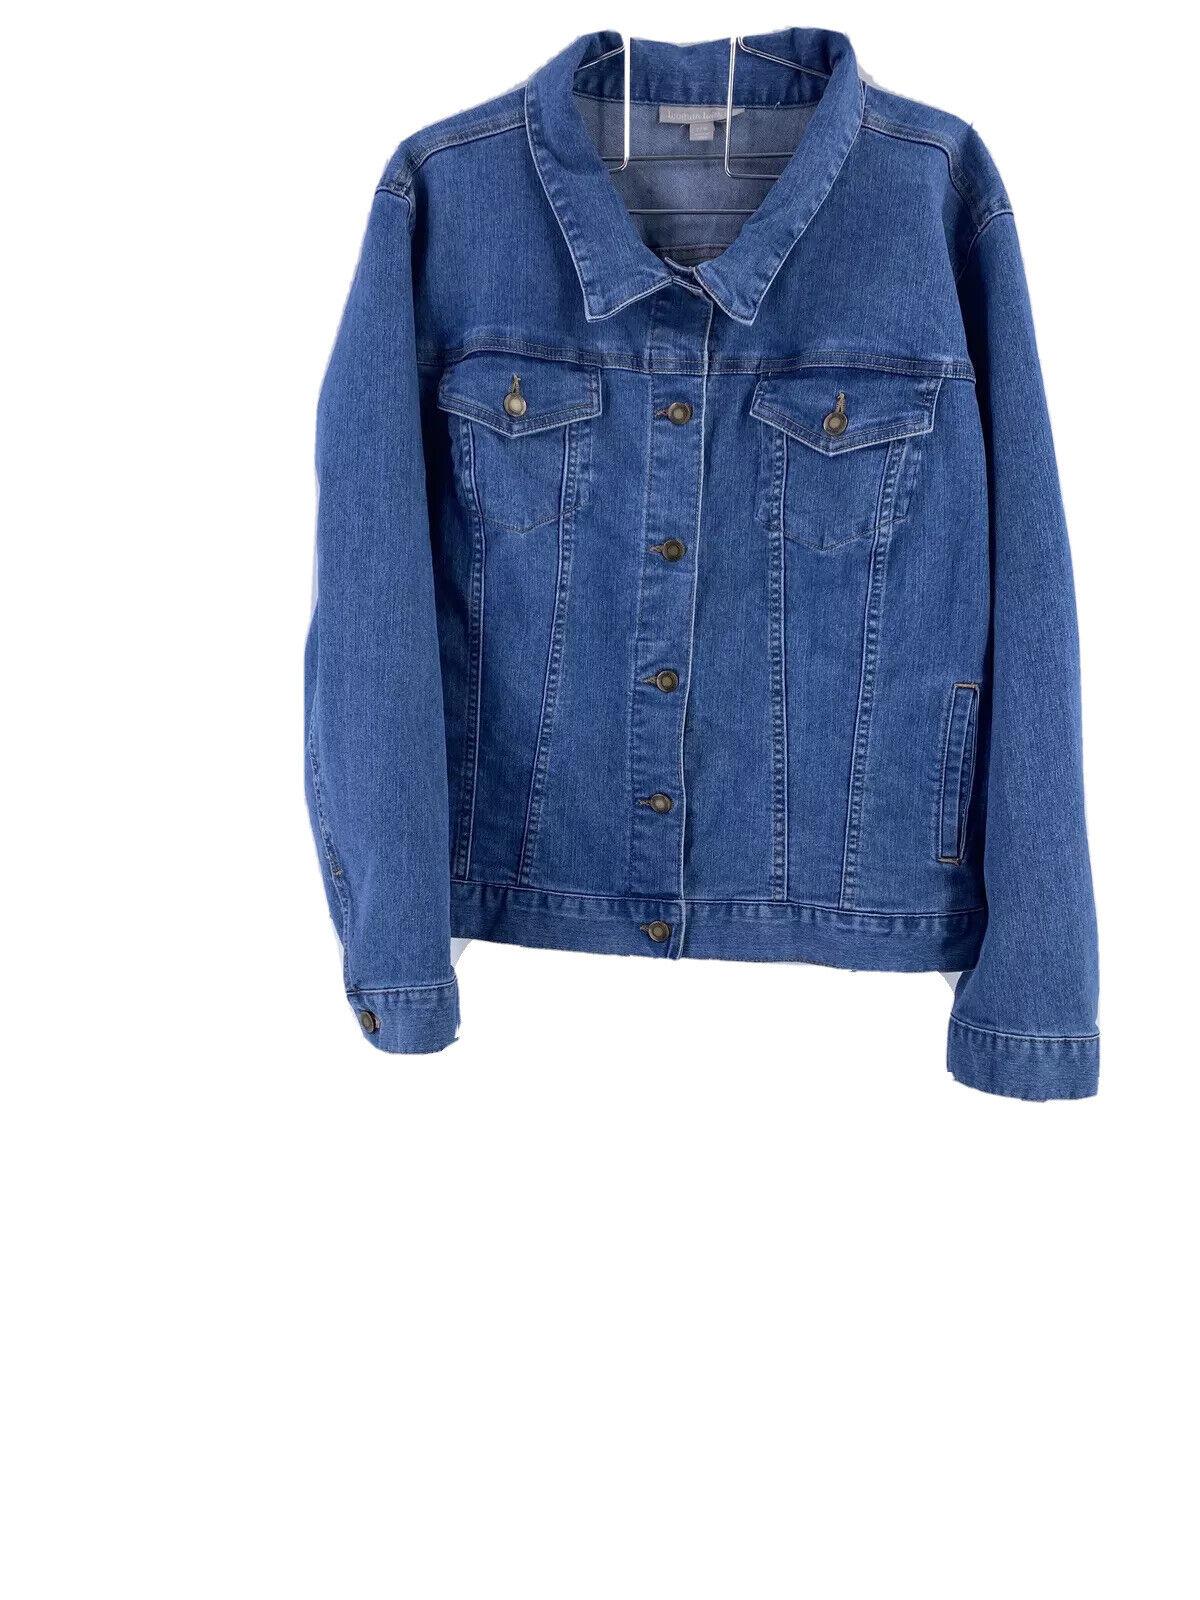 Woman Within 22W Plus Jacket Denim Med Blue Buttondown Front Long SleeveA1